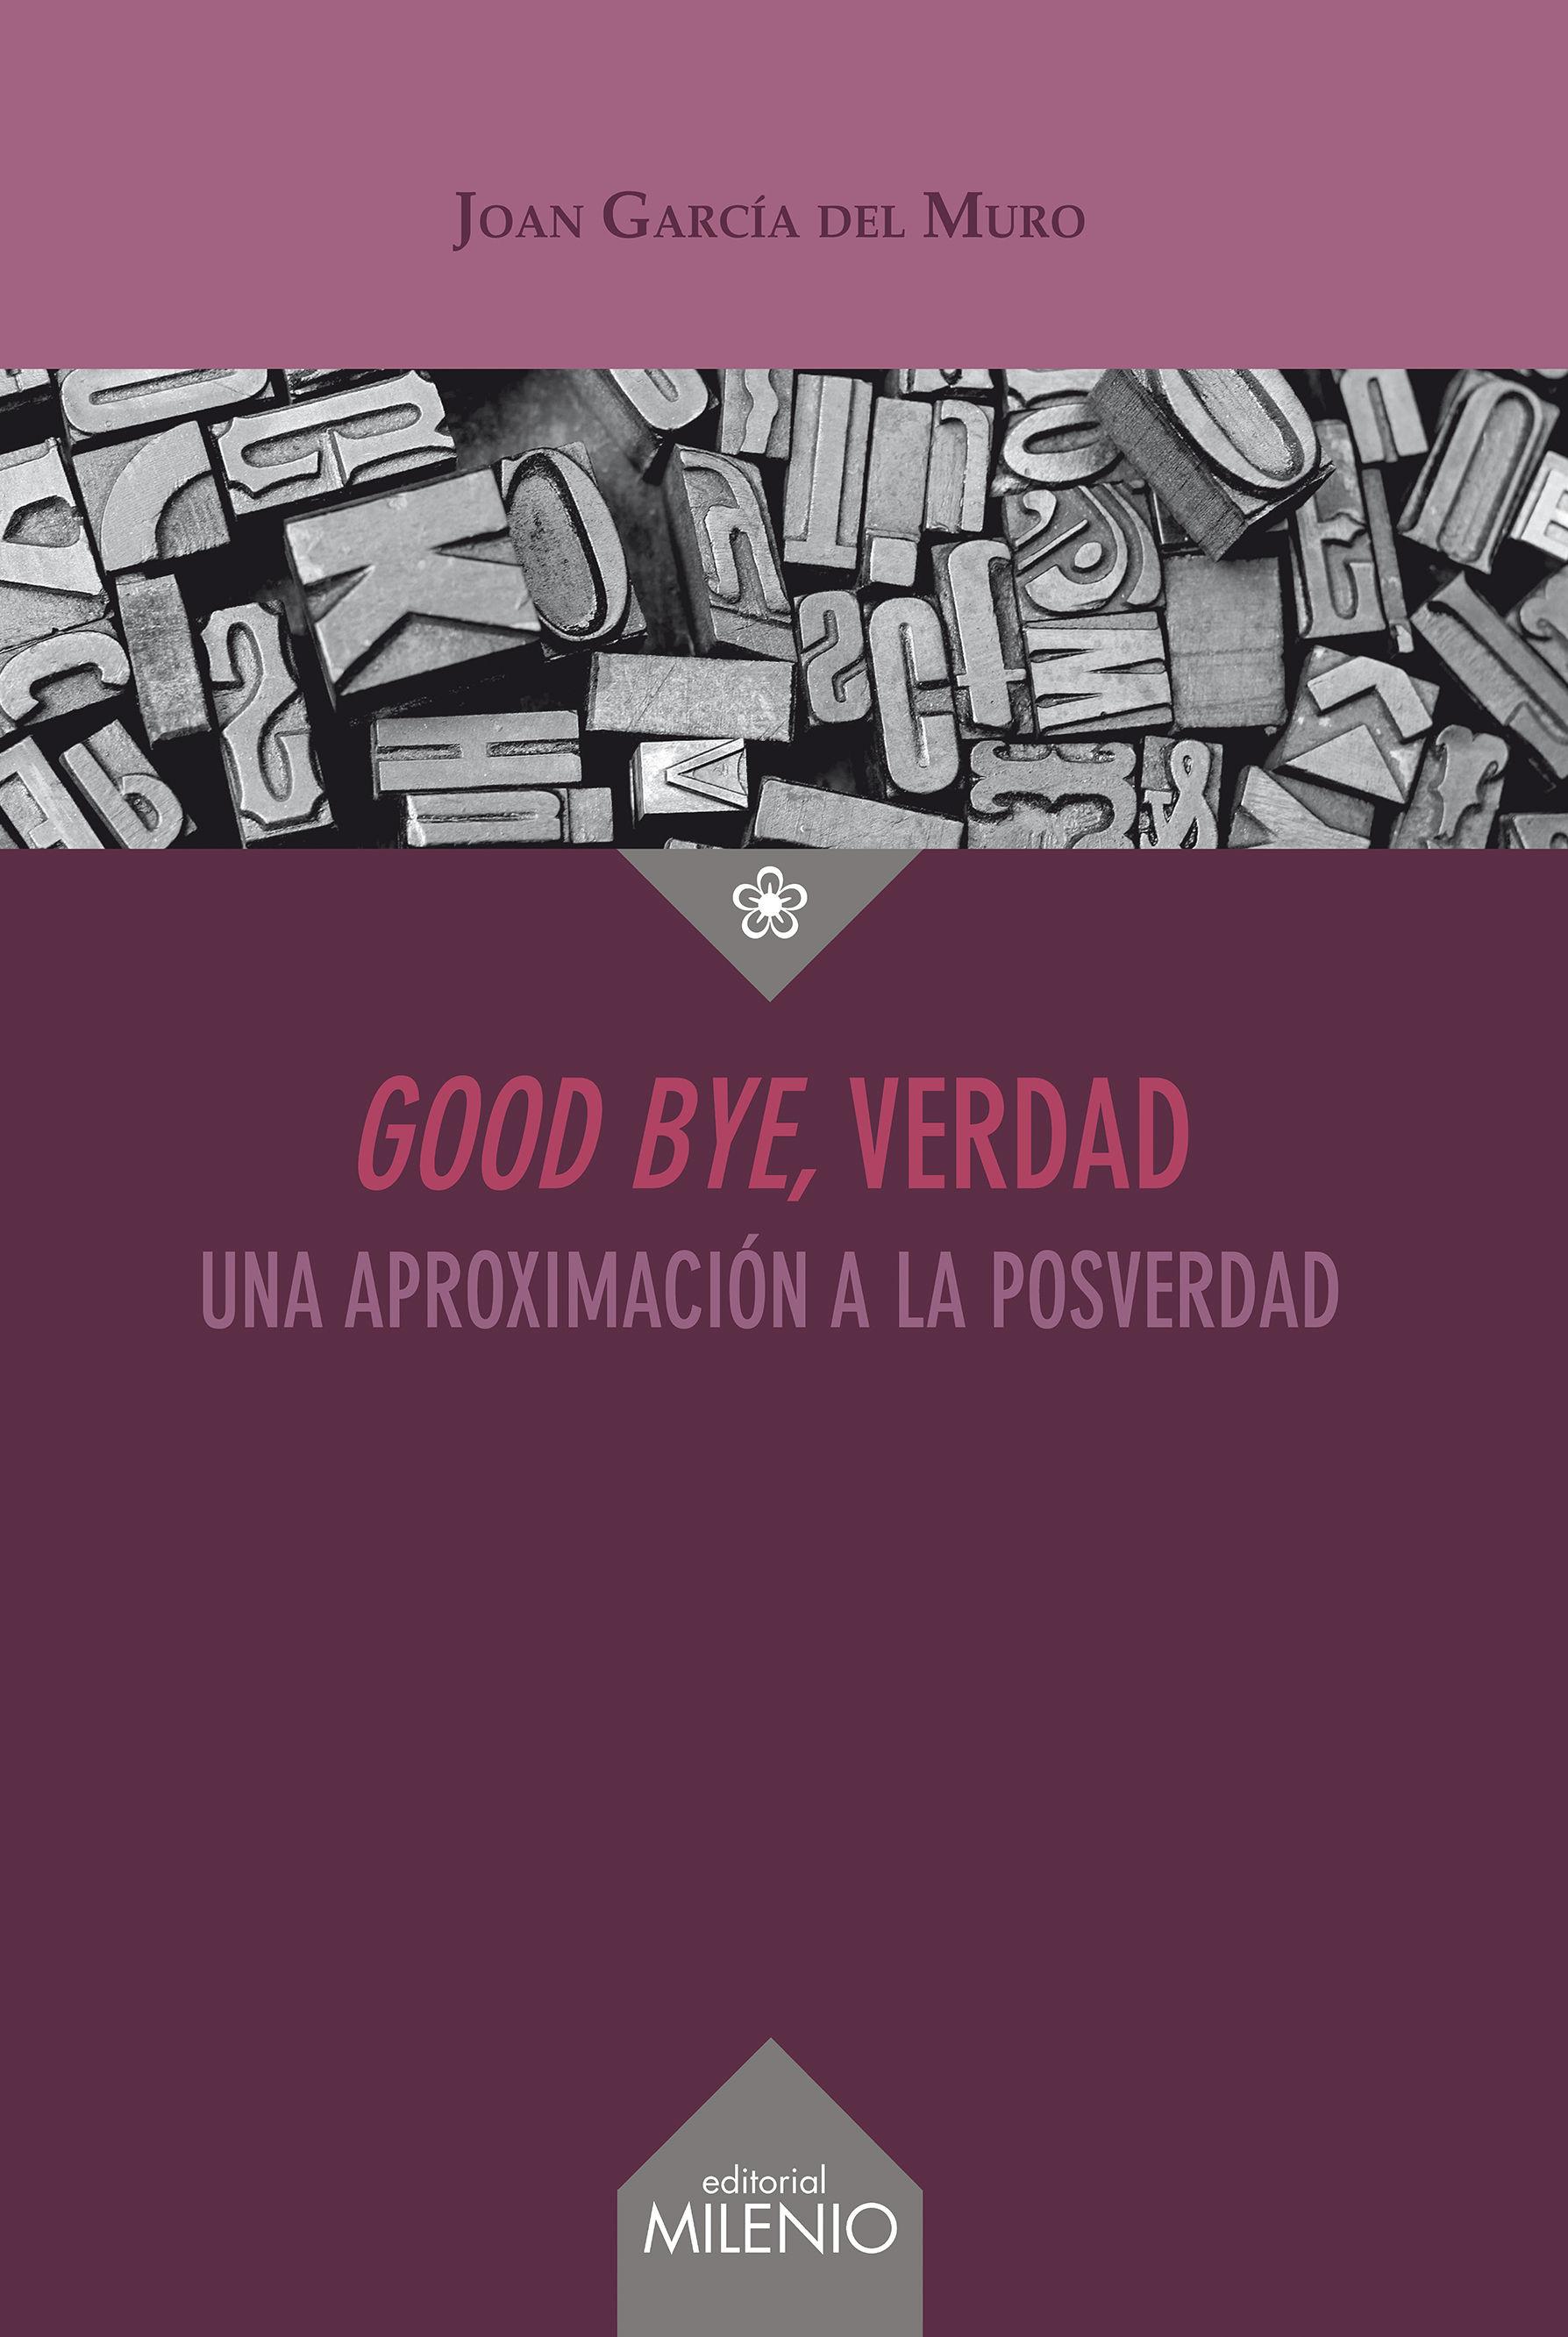 GOOD BYE VERDAD